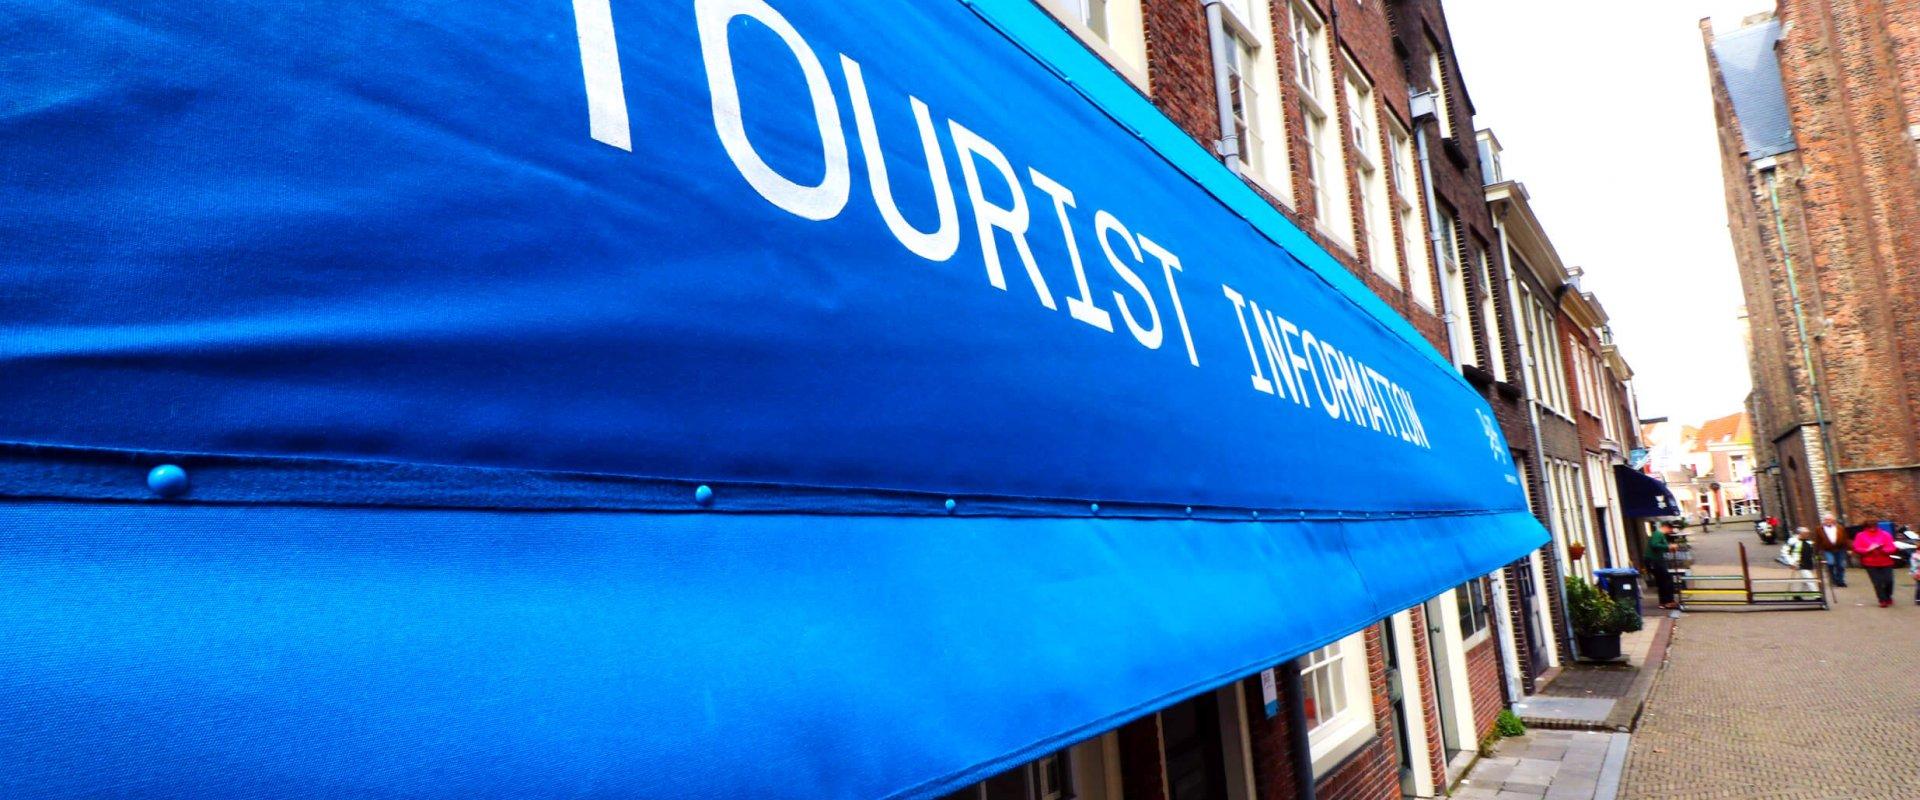 Touristeninformationszentrum Delft — Delft.com